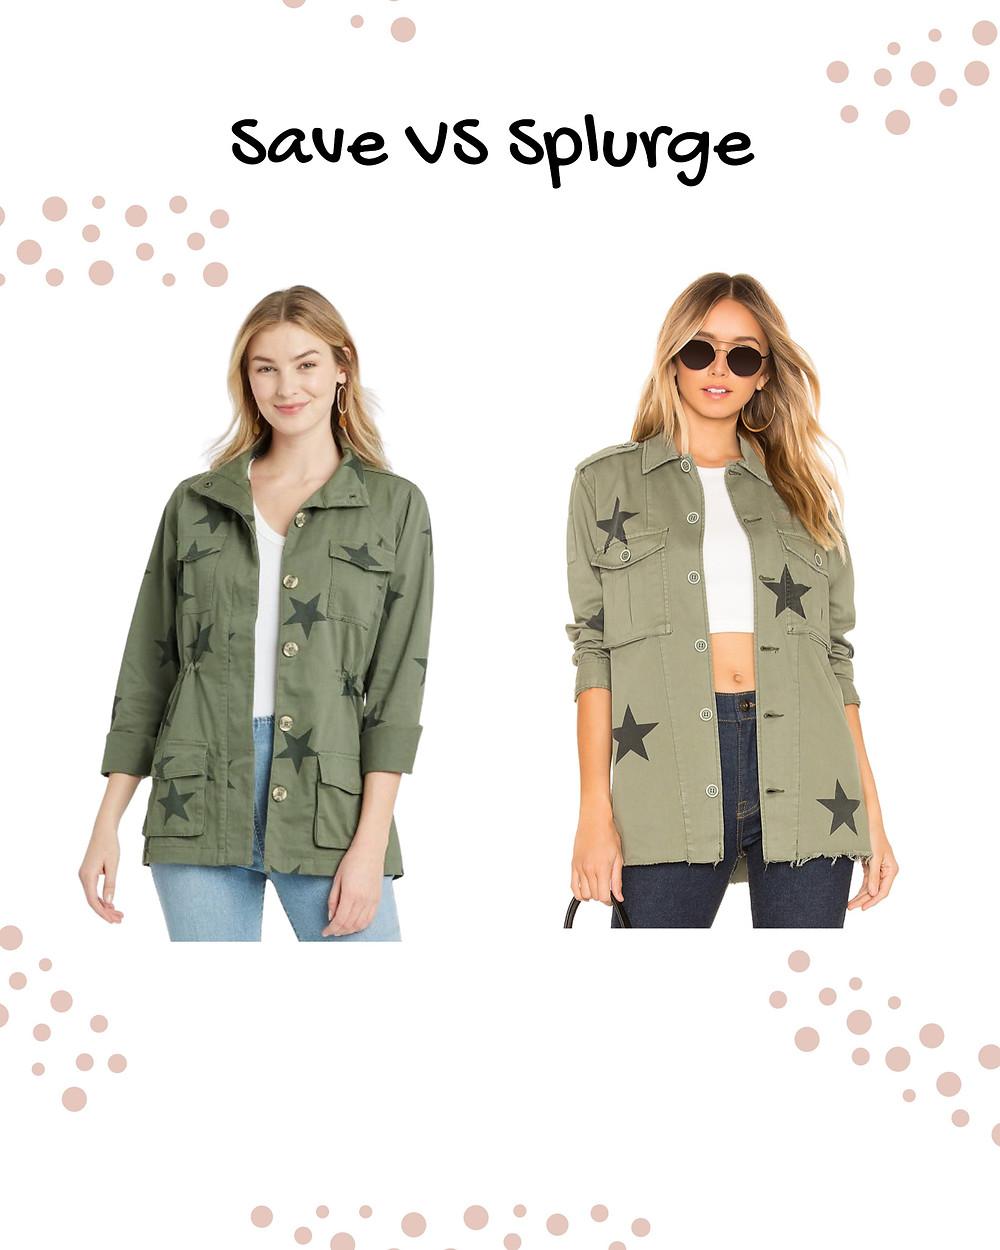 save vs splurge  army jacket. military jacket. stars jacket